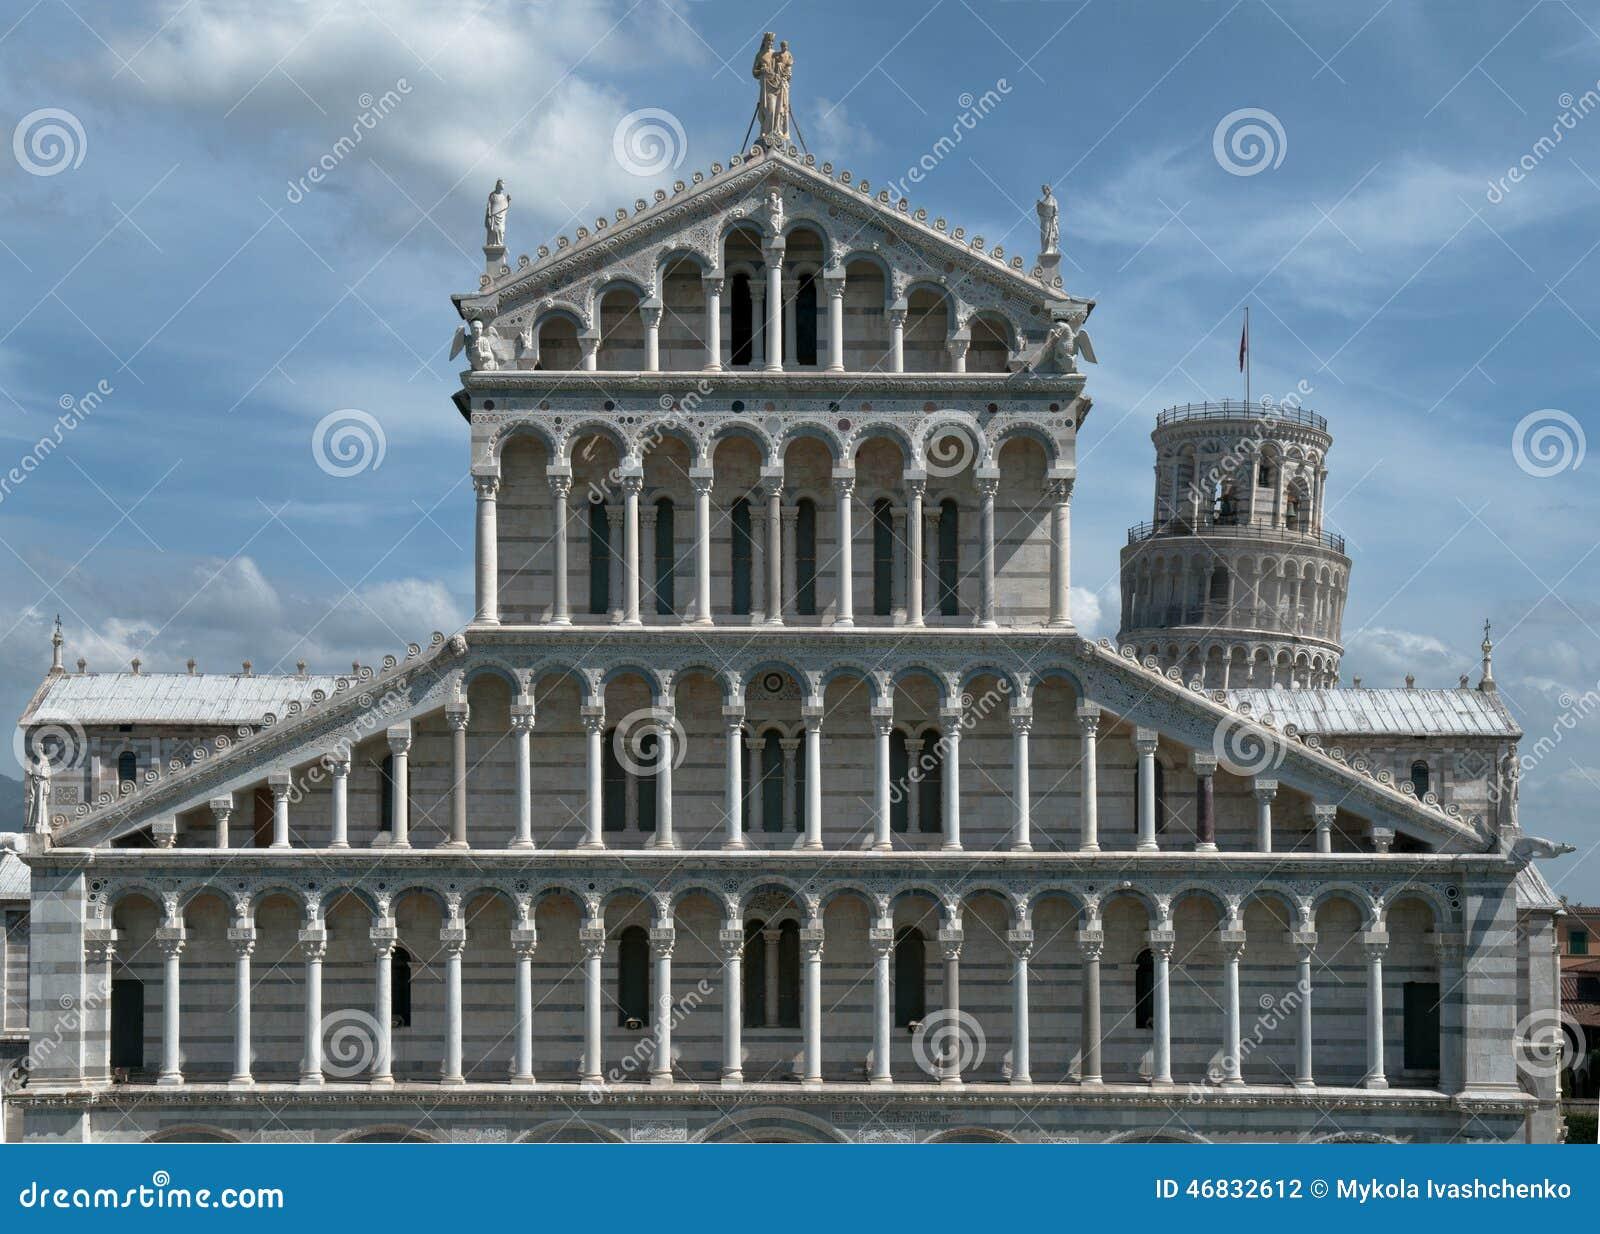 Pisa ber hmte architektur stockfoto bild 46832612 - Beruhmte architektur ...